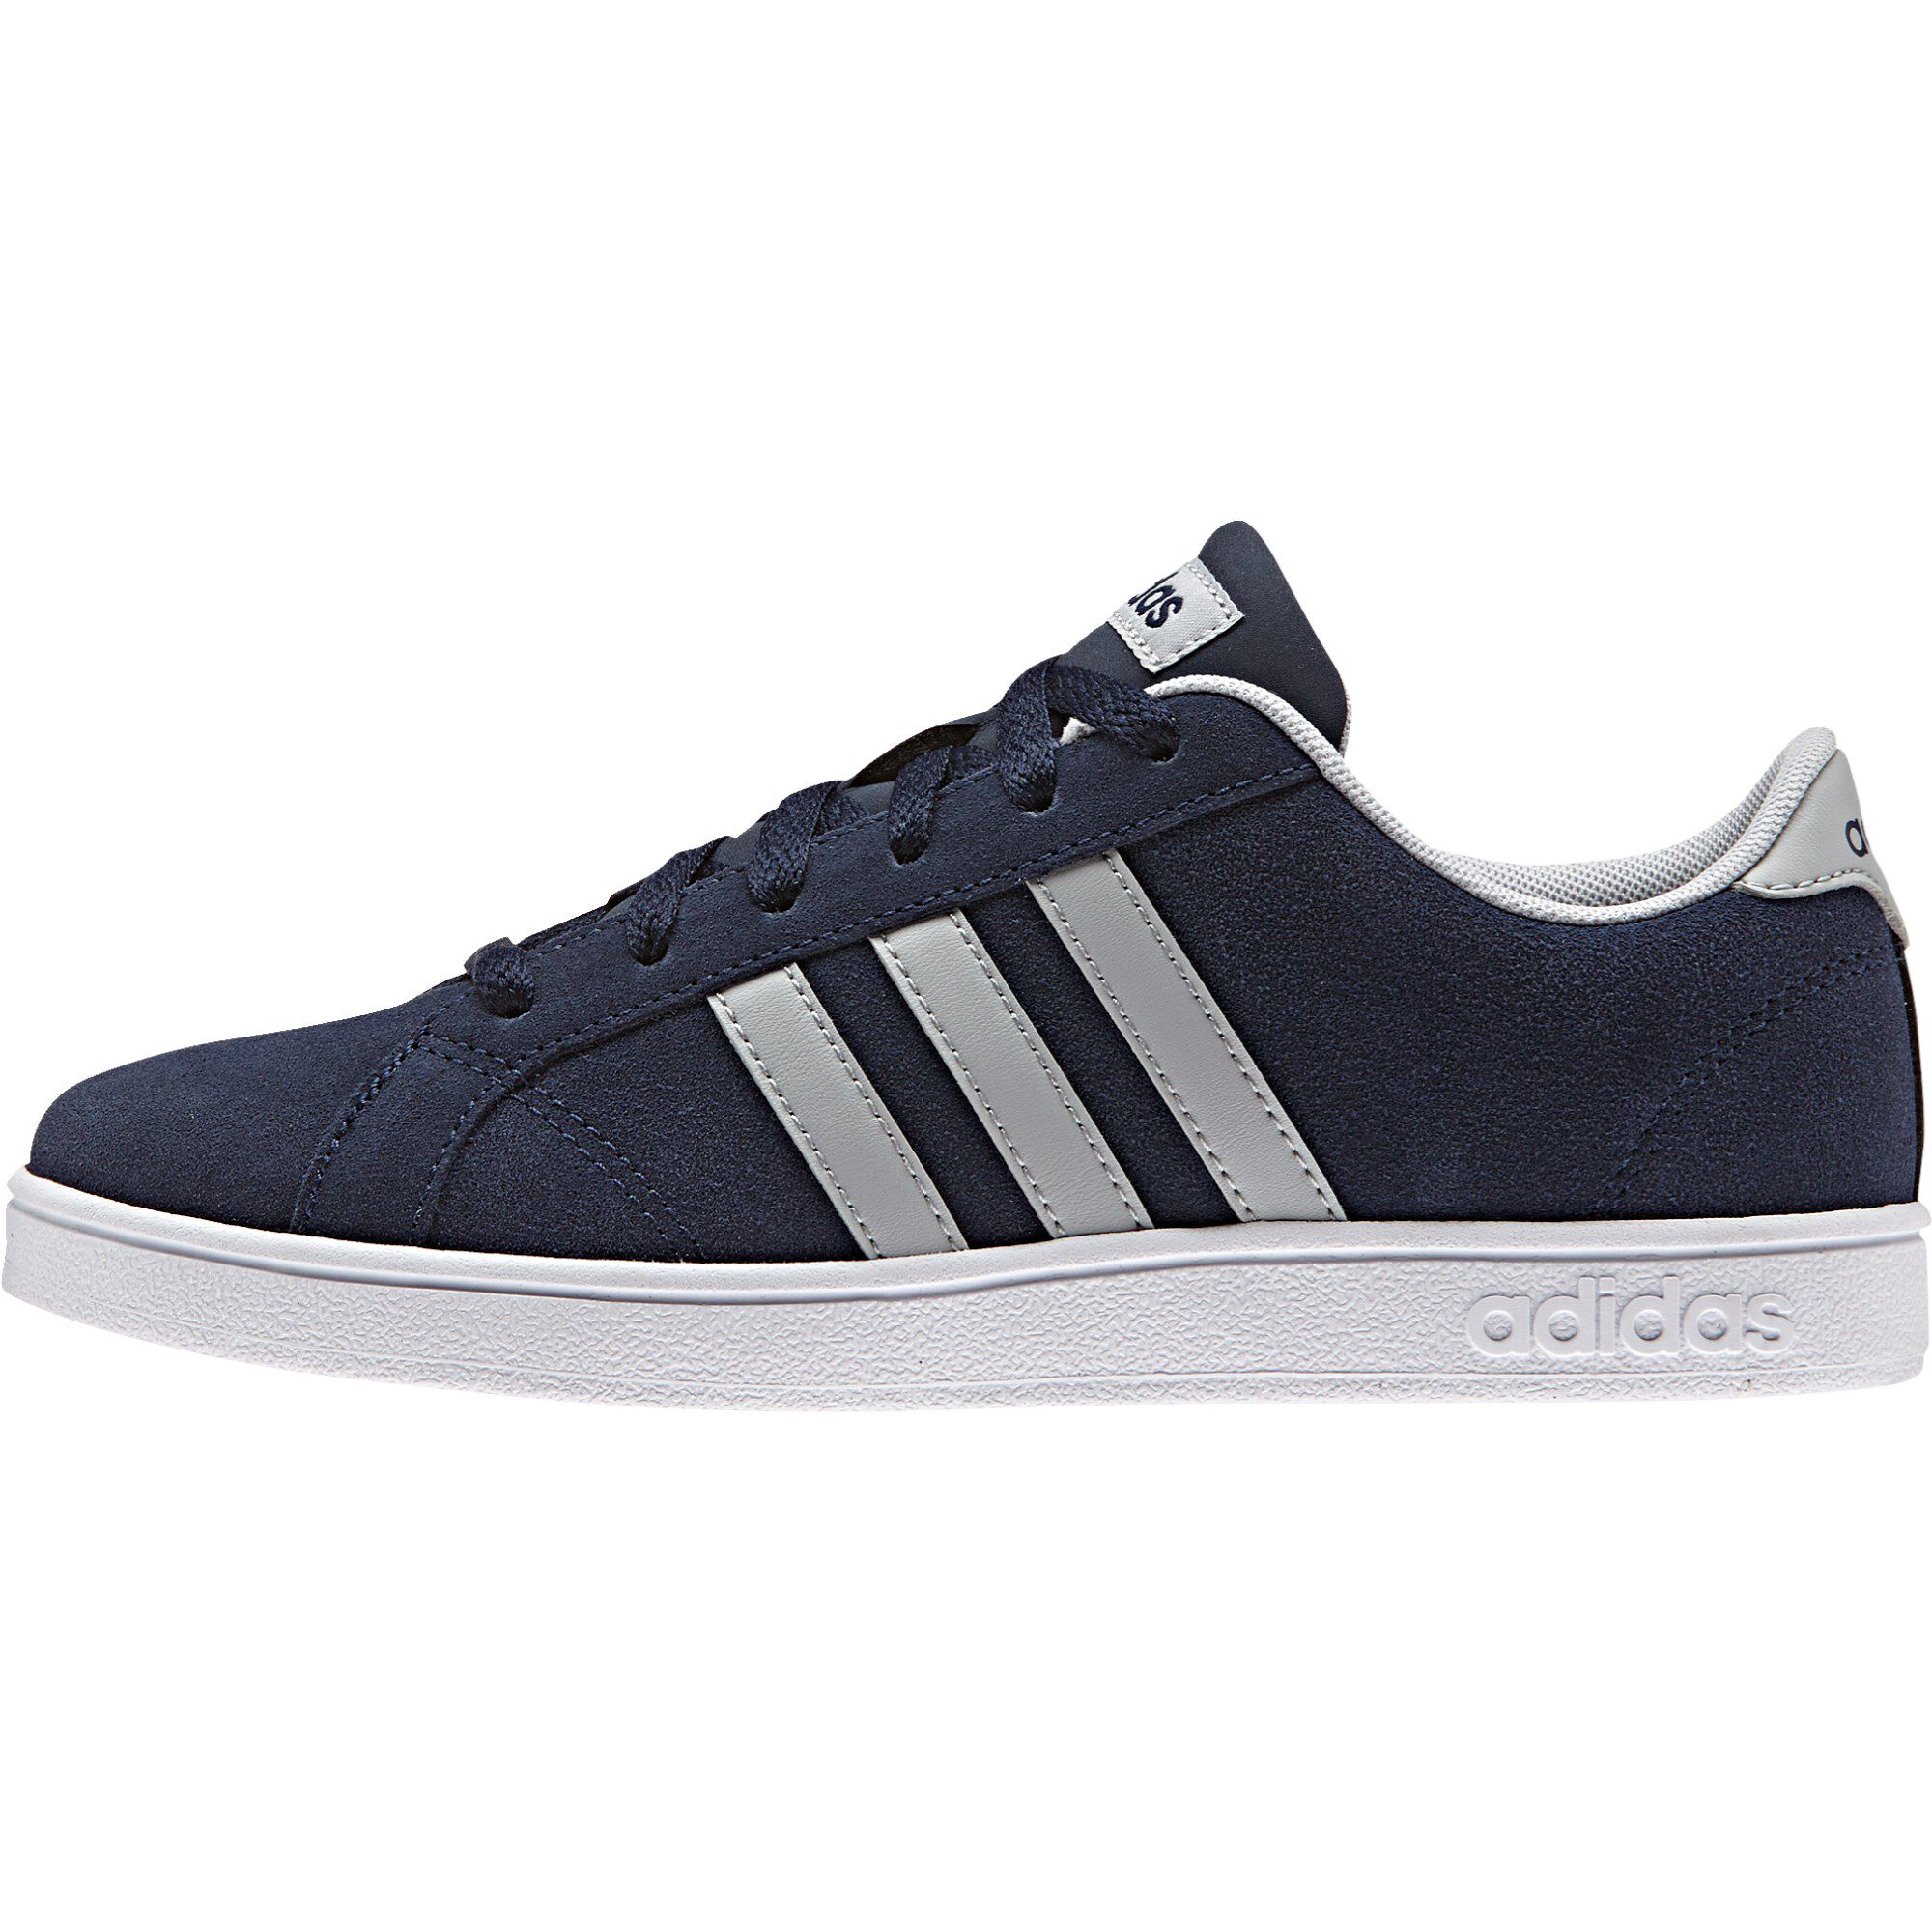 cc2ec89c4b97 ... amazon blå adidas neo baseline børn intersport.dk dab46 6e288